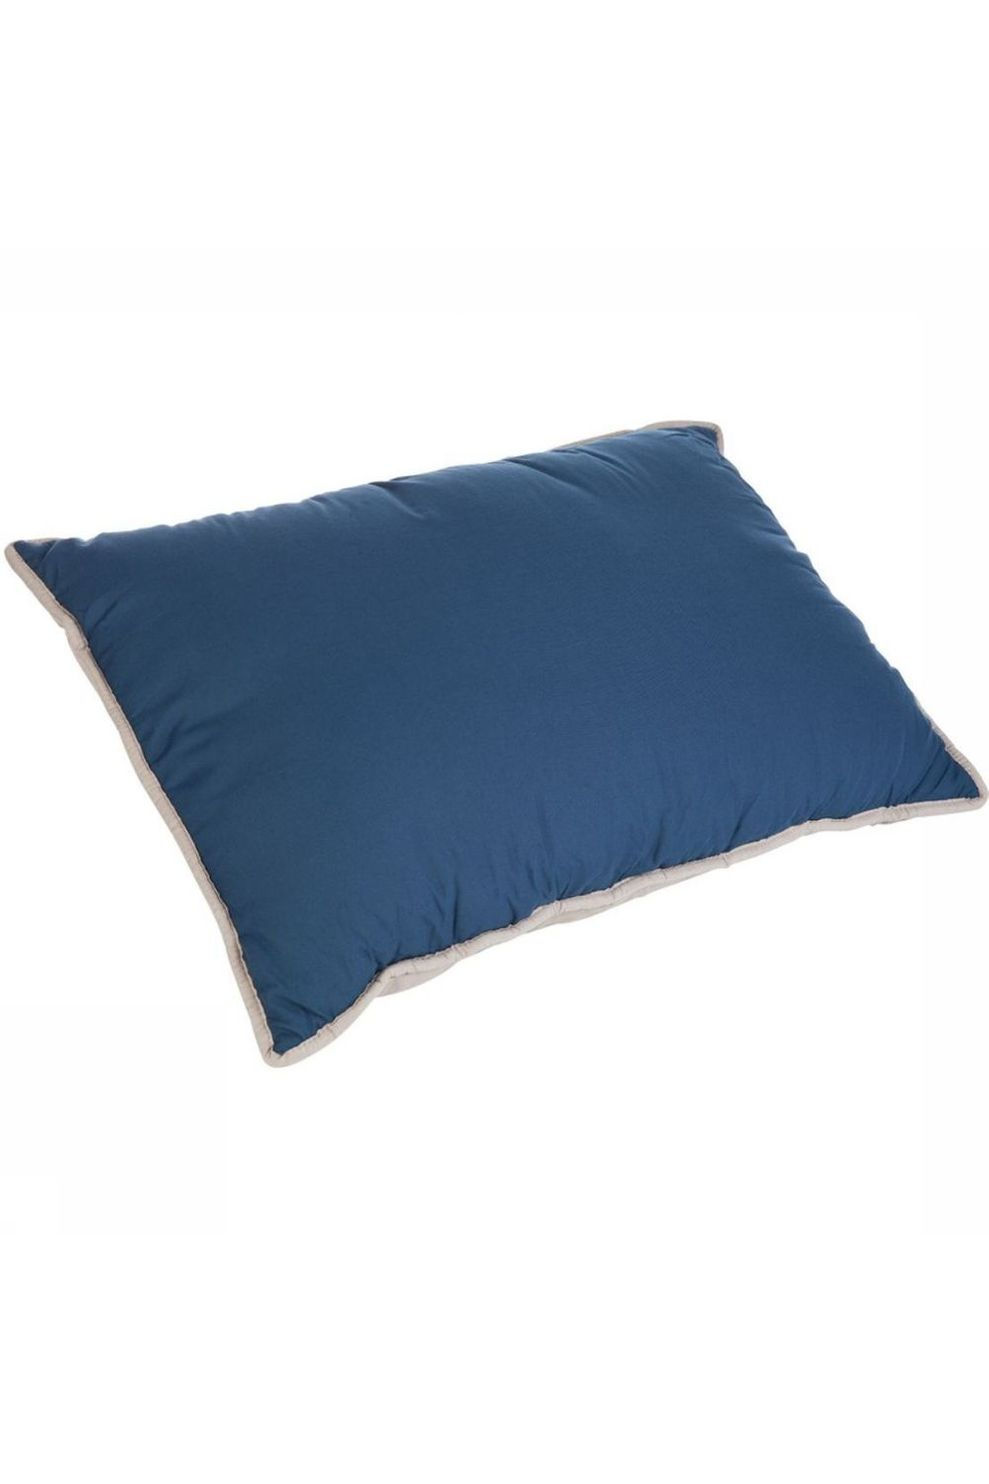 Nomad Kussen Camping Pillow - Blauw